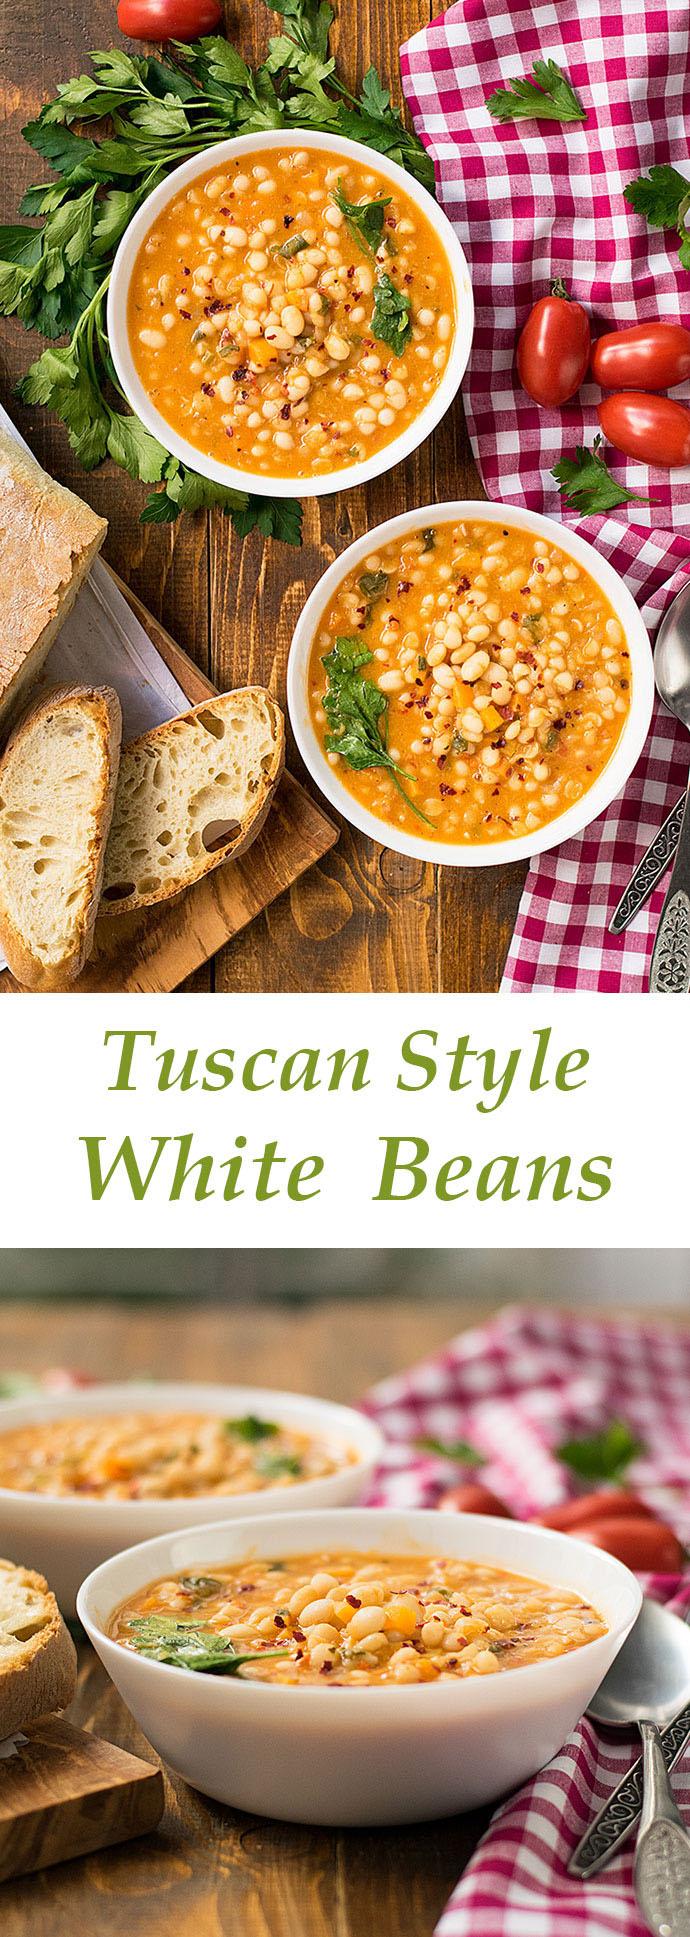 tuscan-style-white-beans-5